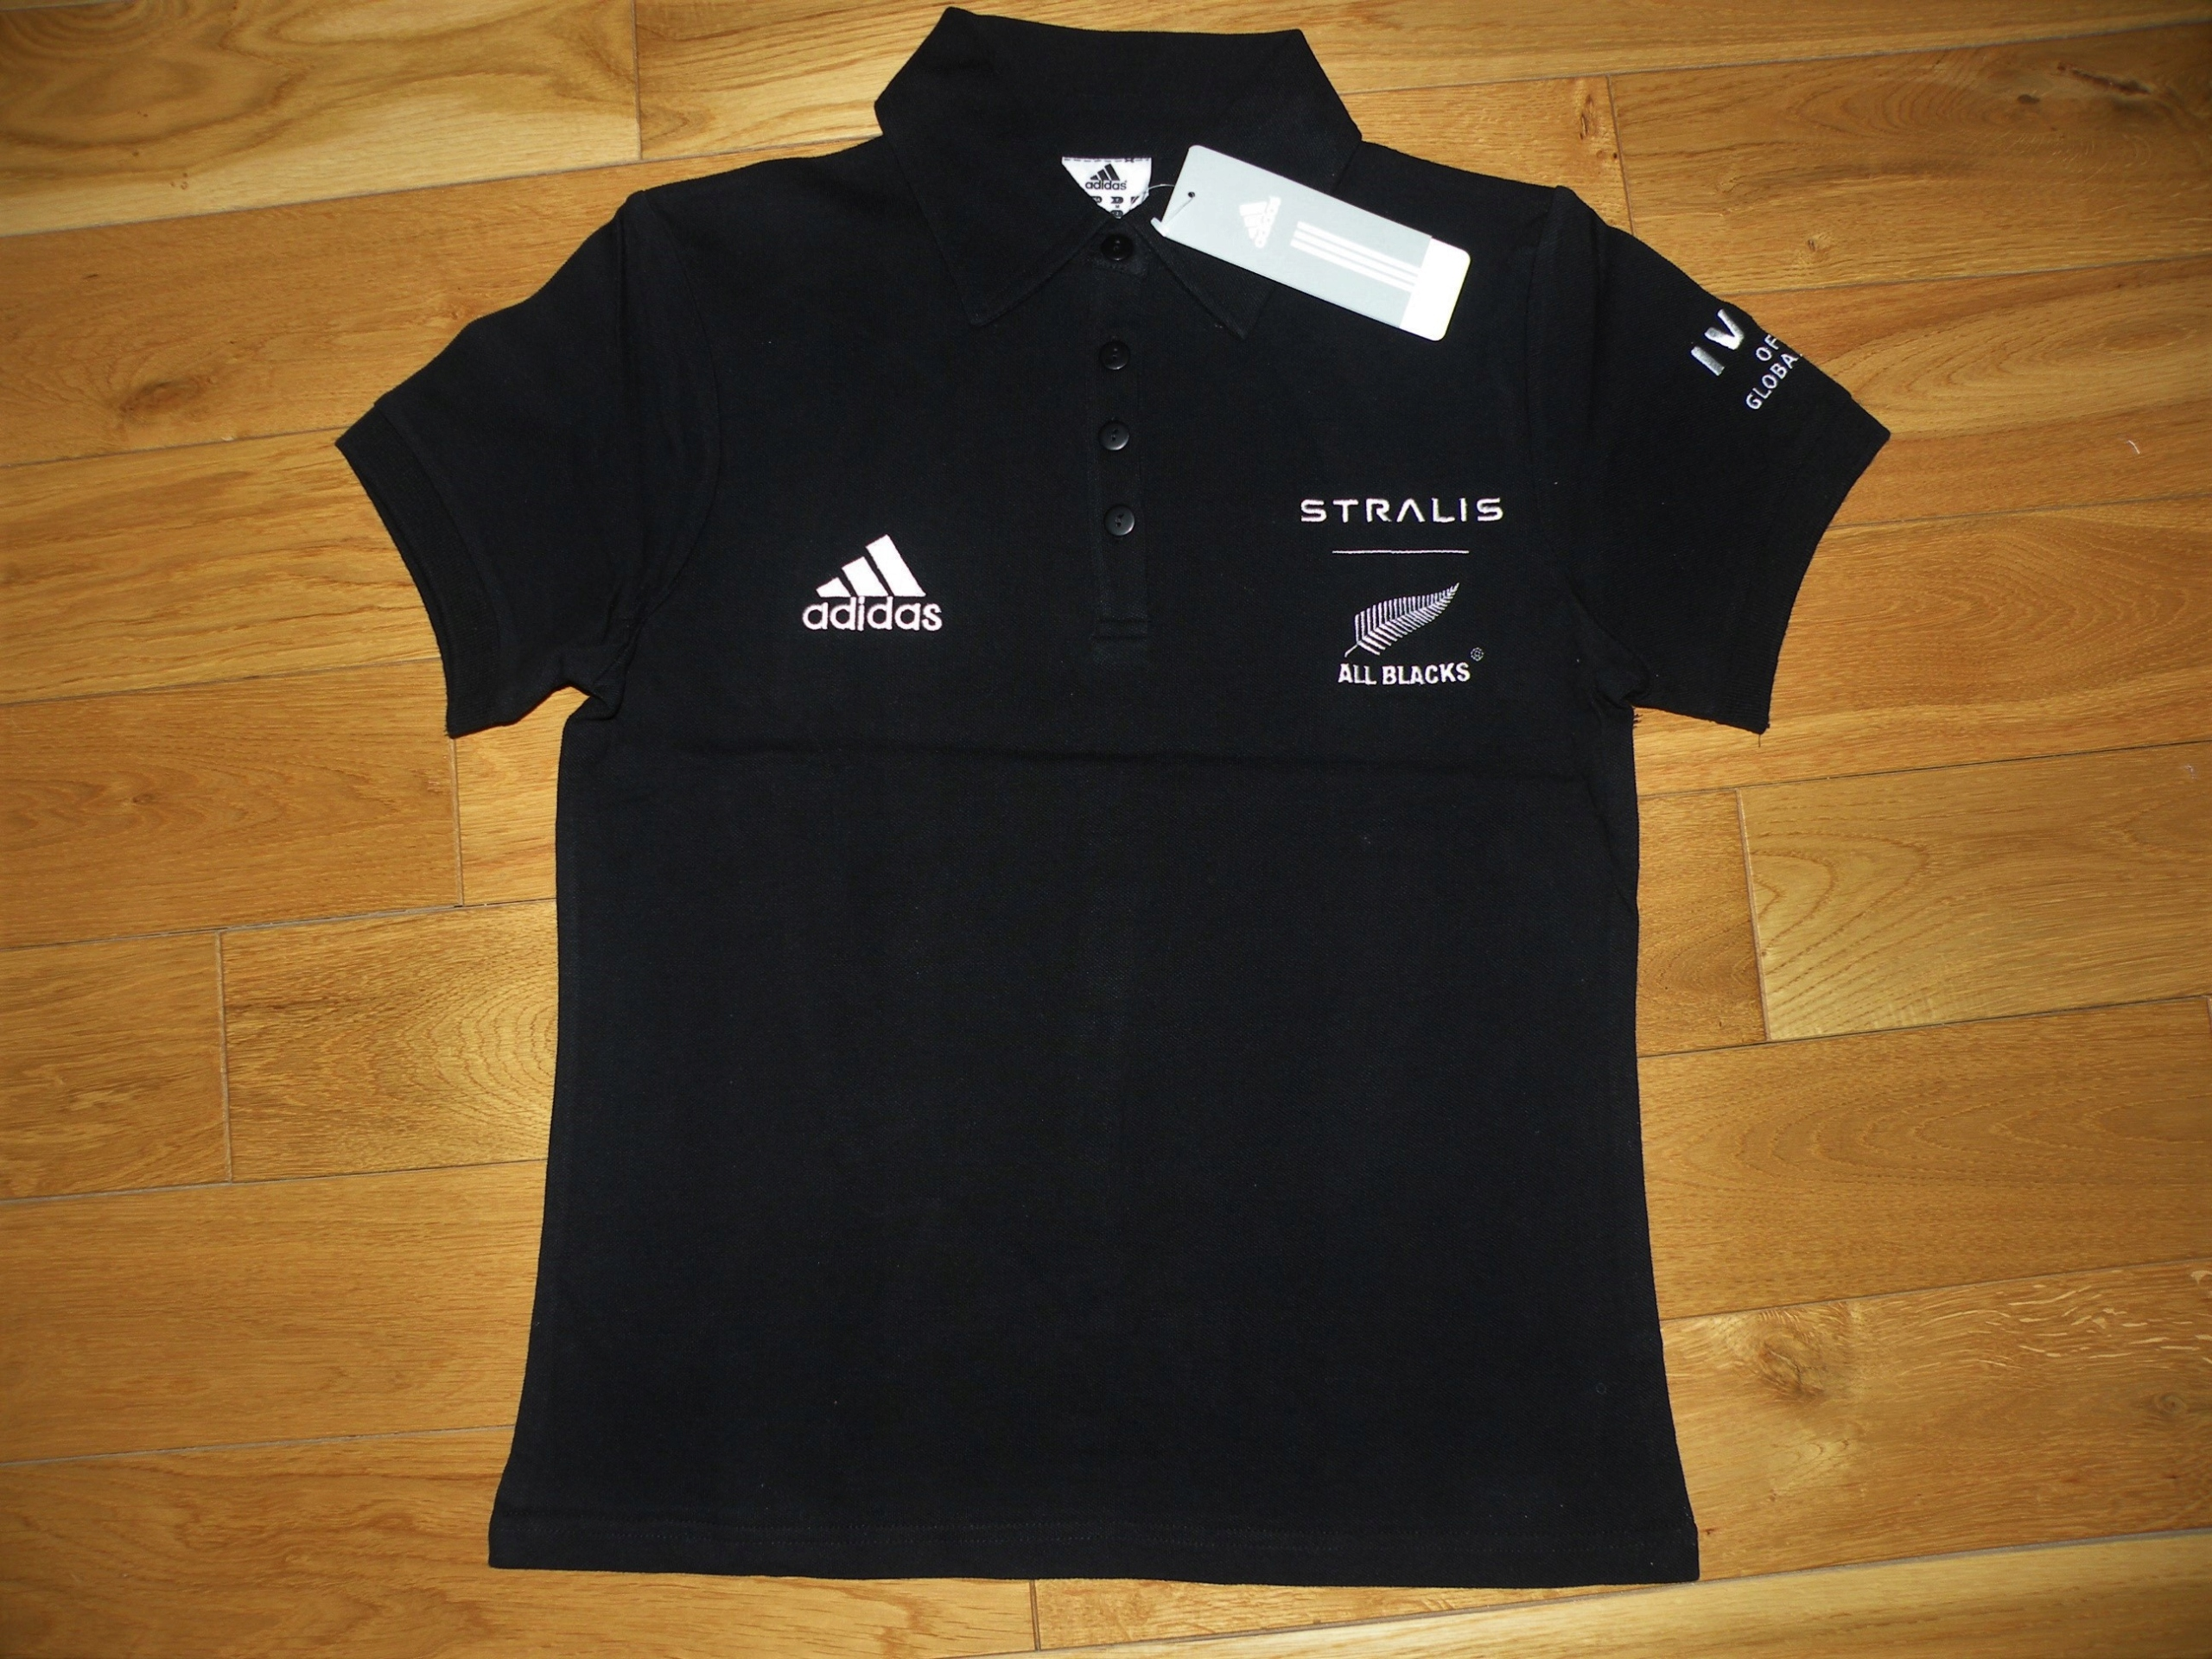 90e4d9a88 koszulka POLO damska ADIDAS IVECO ALL BLACKS r. S - 7510670709 ...